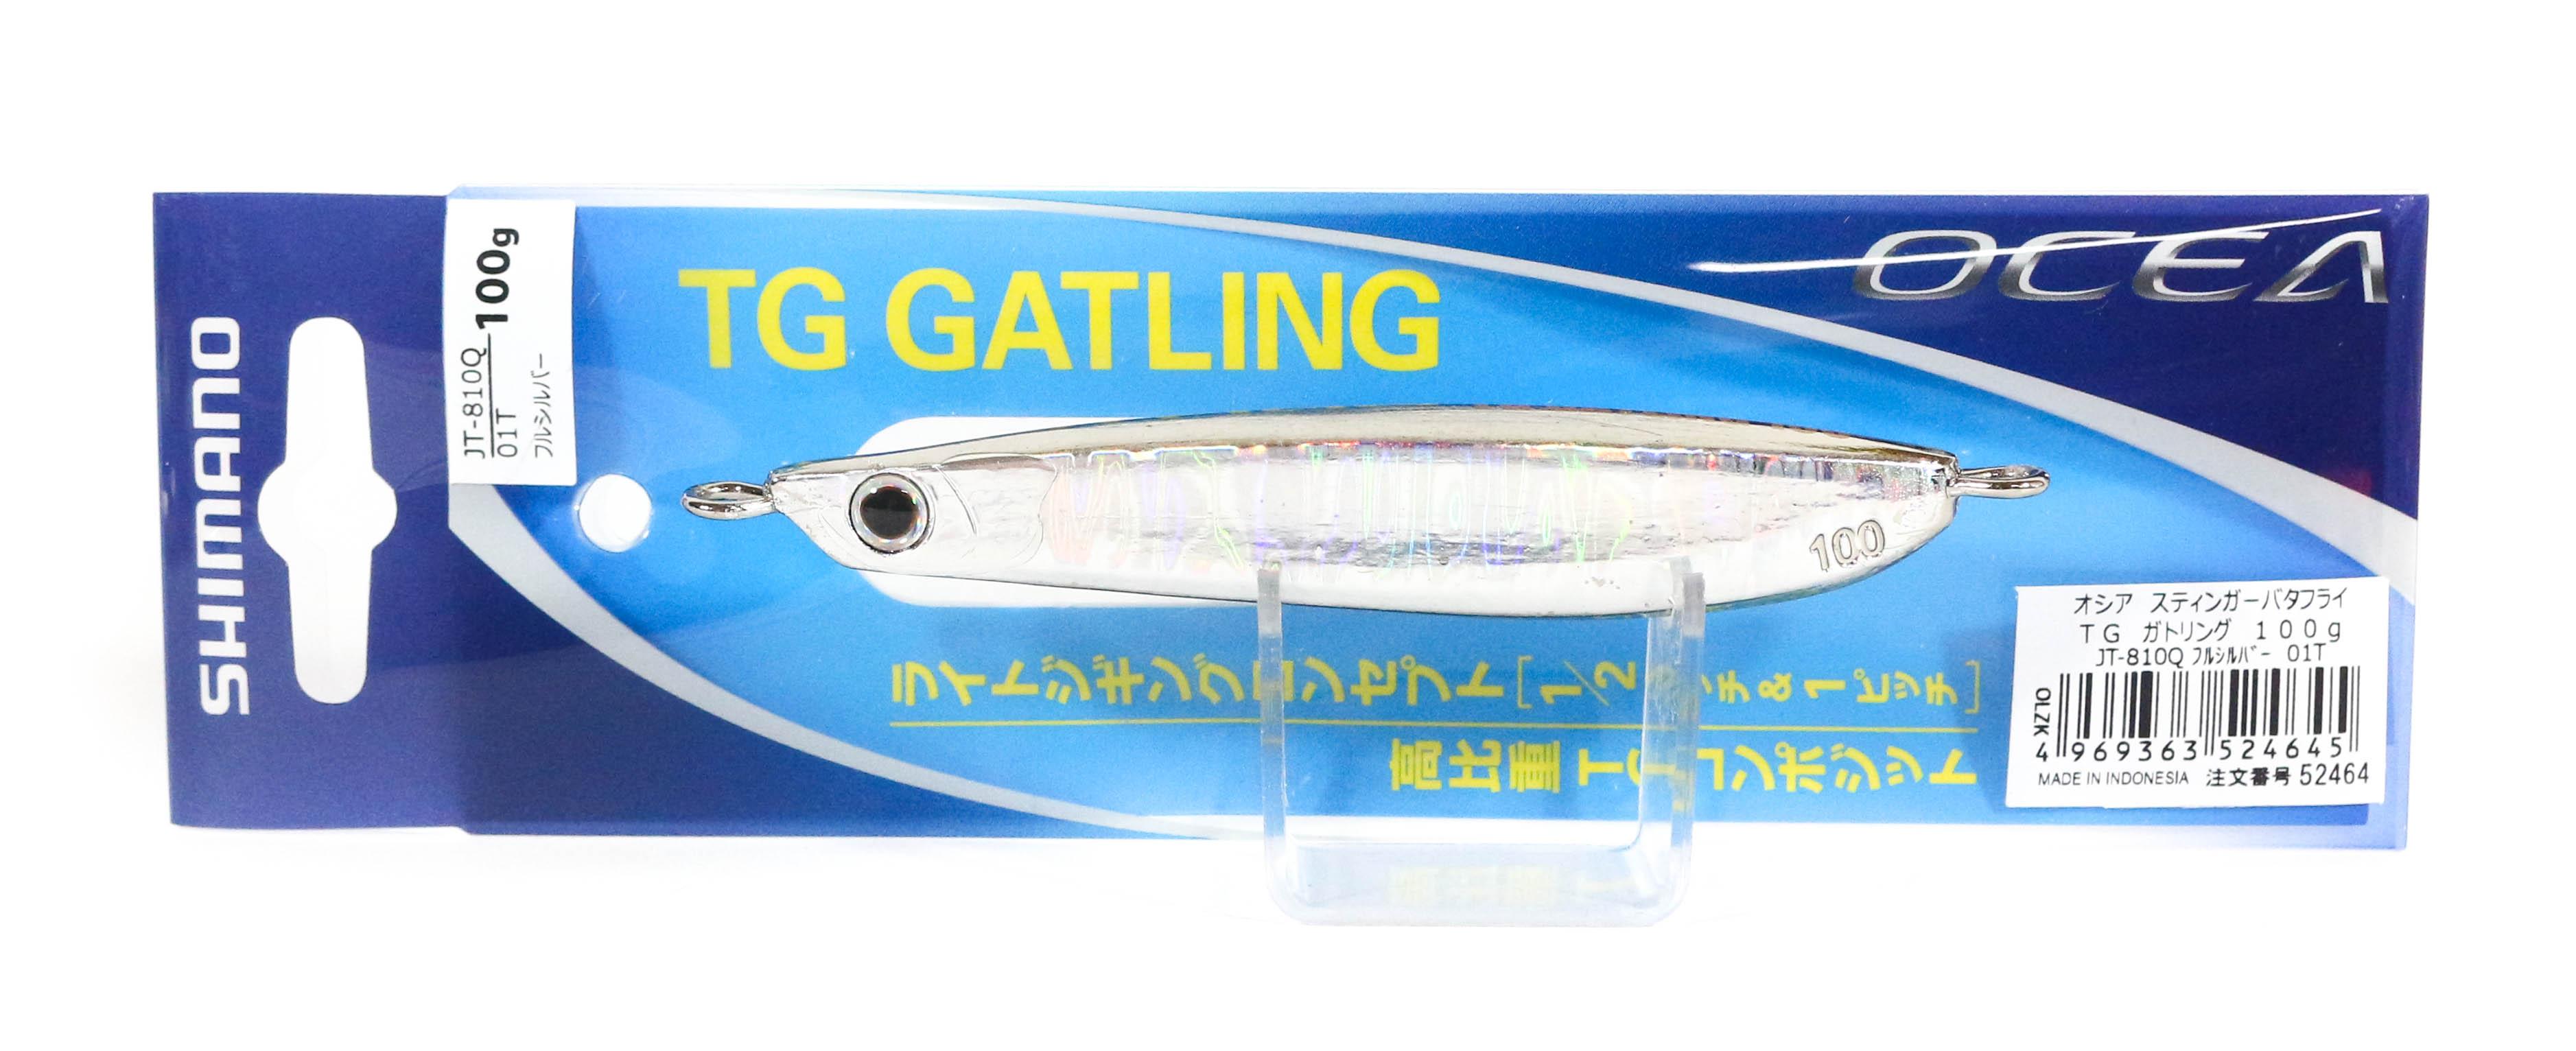 Shimano JT-810Q Metal Jig TG Gatling 100 grams 01T 524645